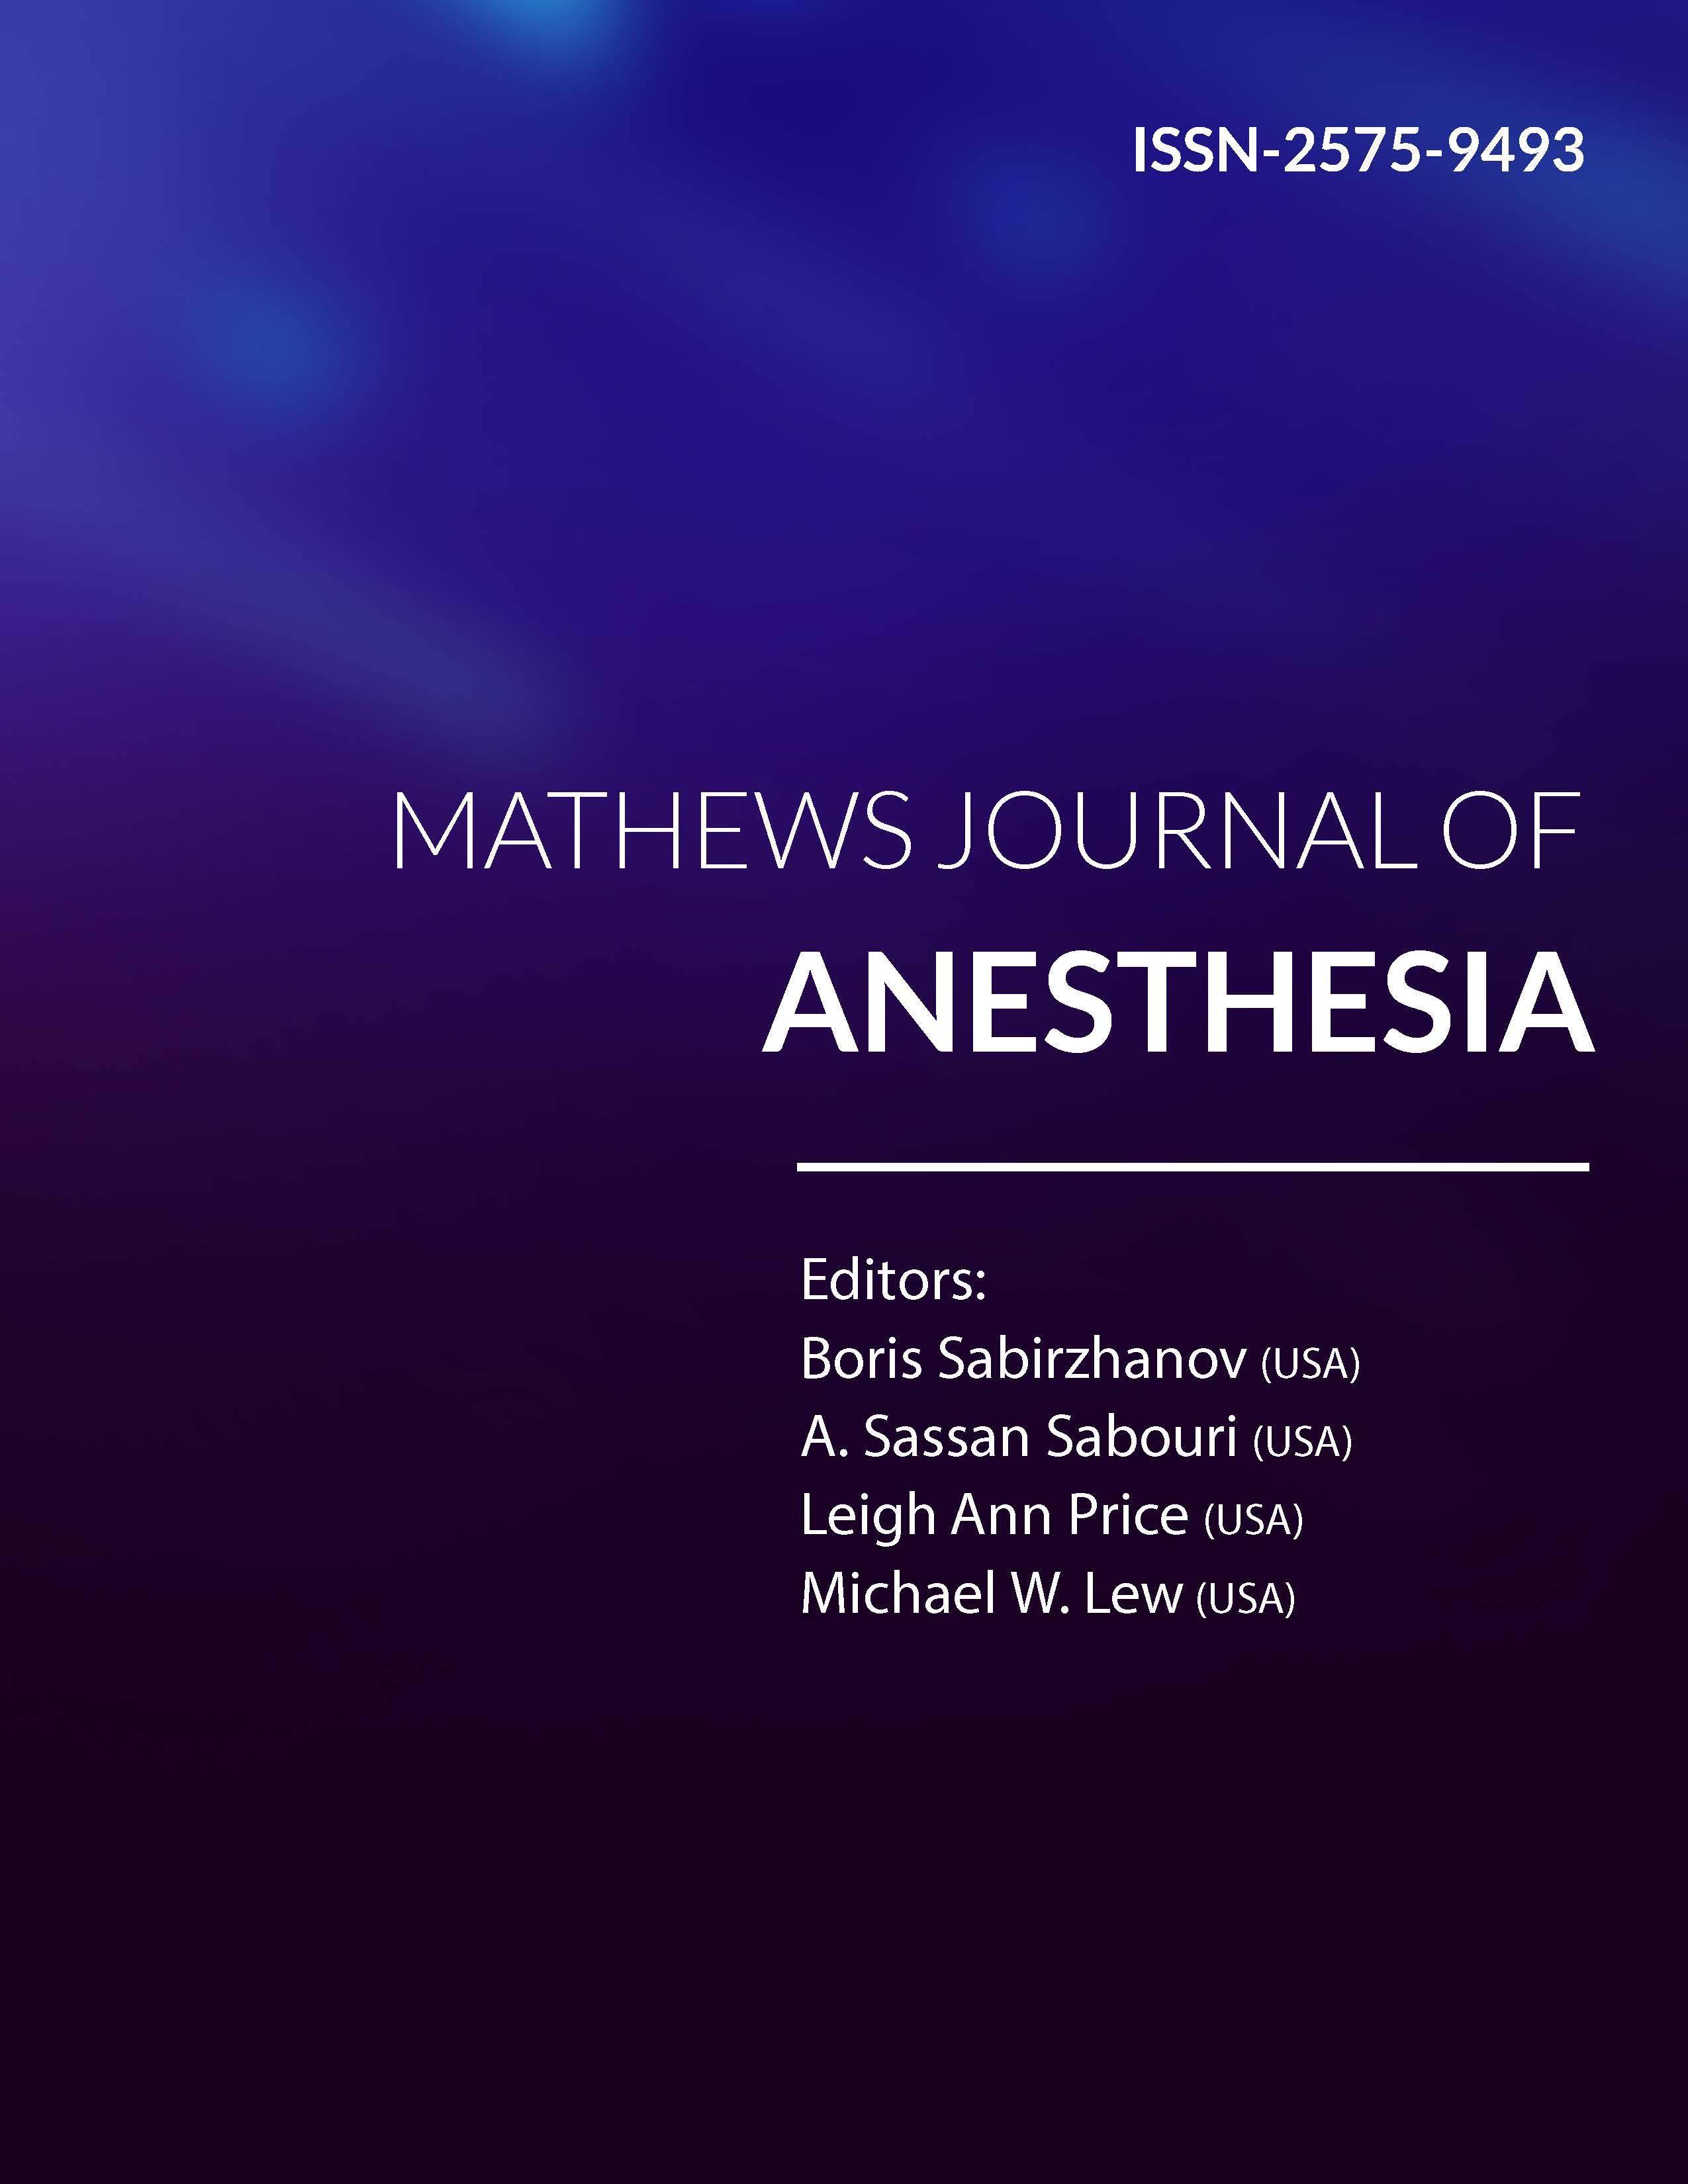 Mathews Journal of Anesthesia